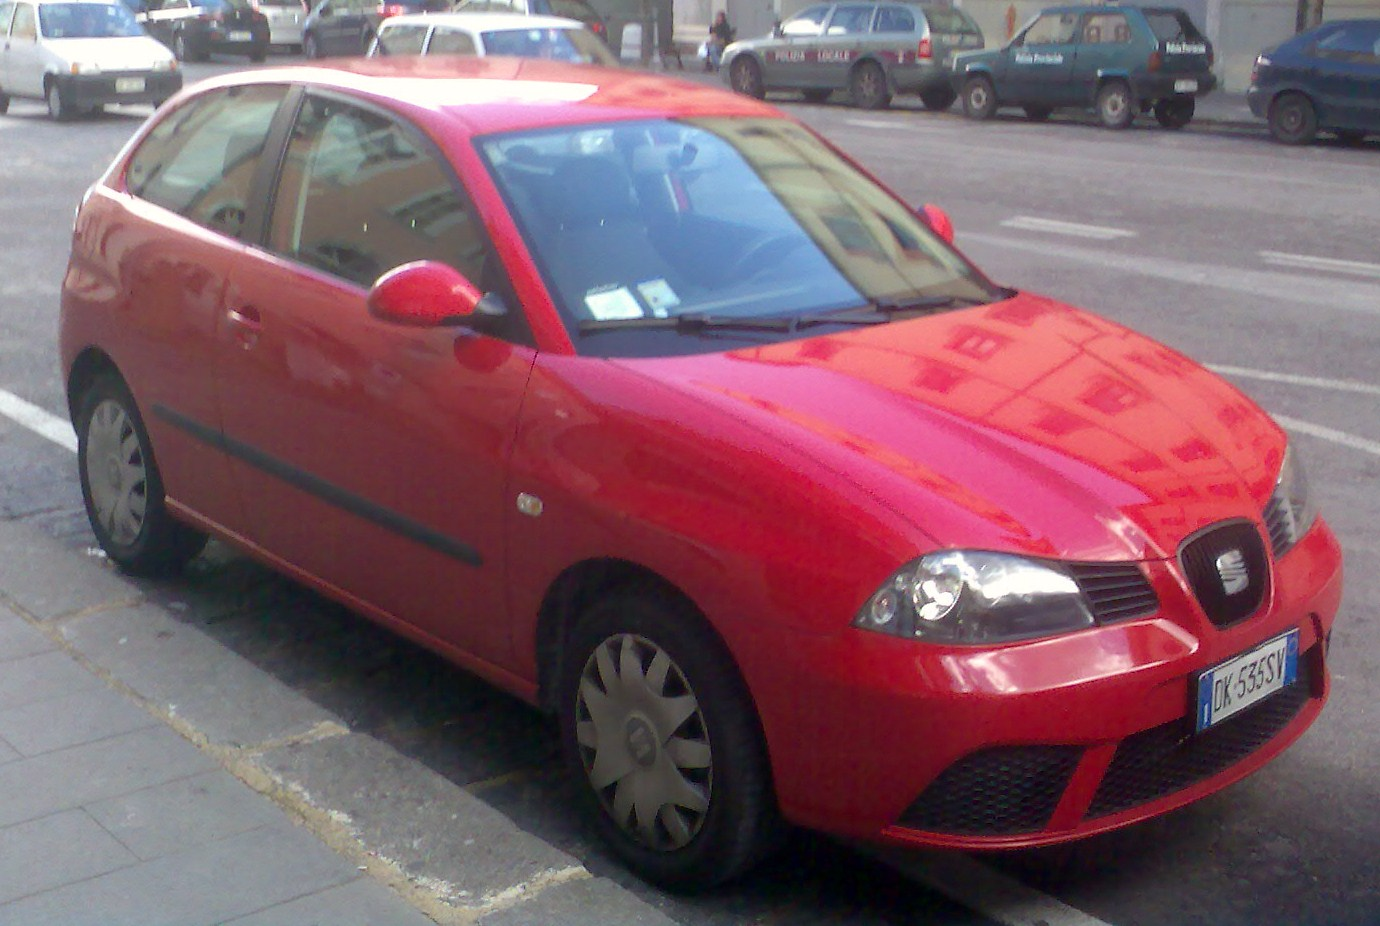 SEAT IBIZA 1.2 red